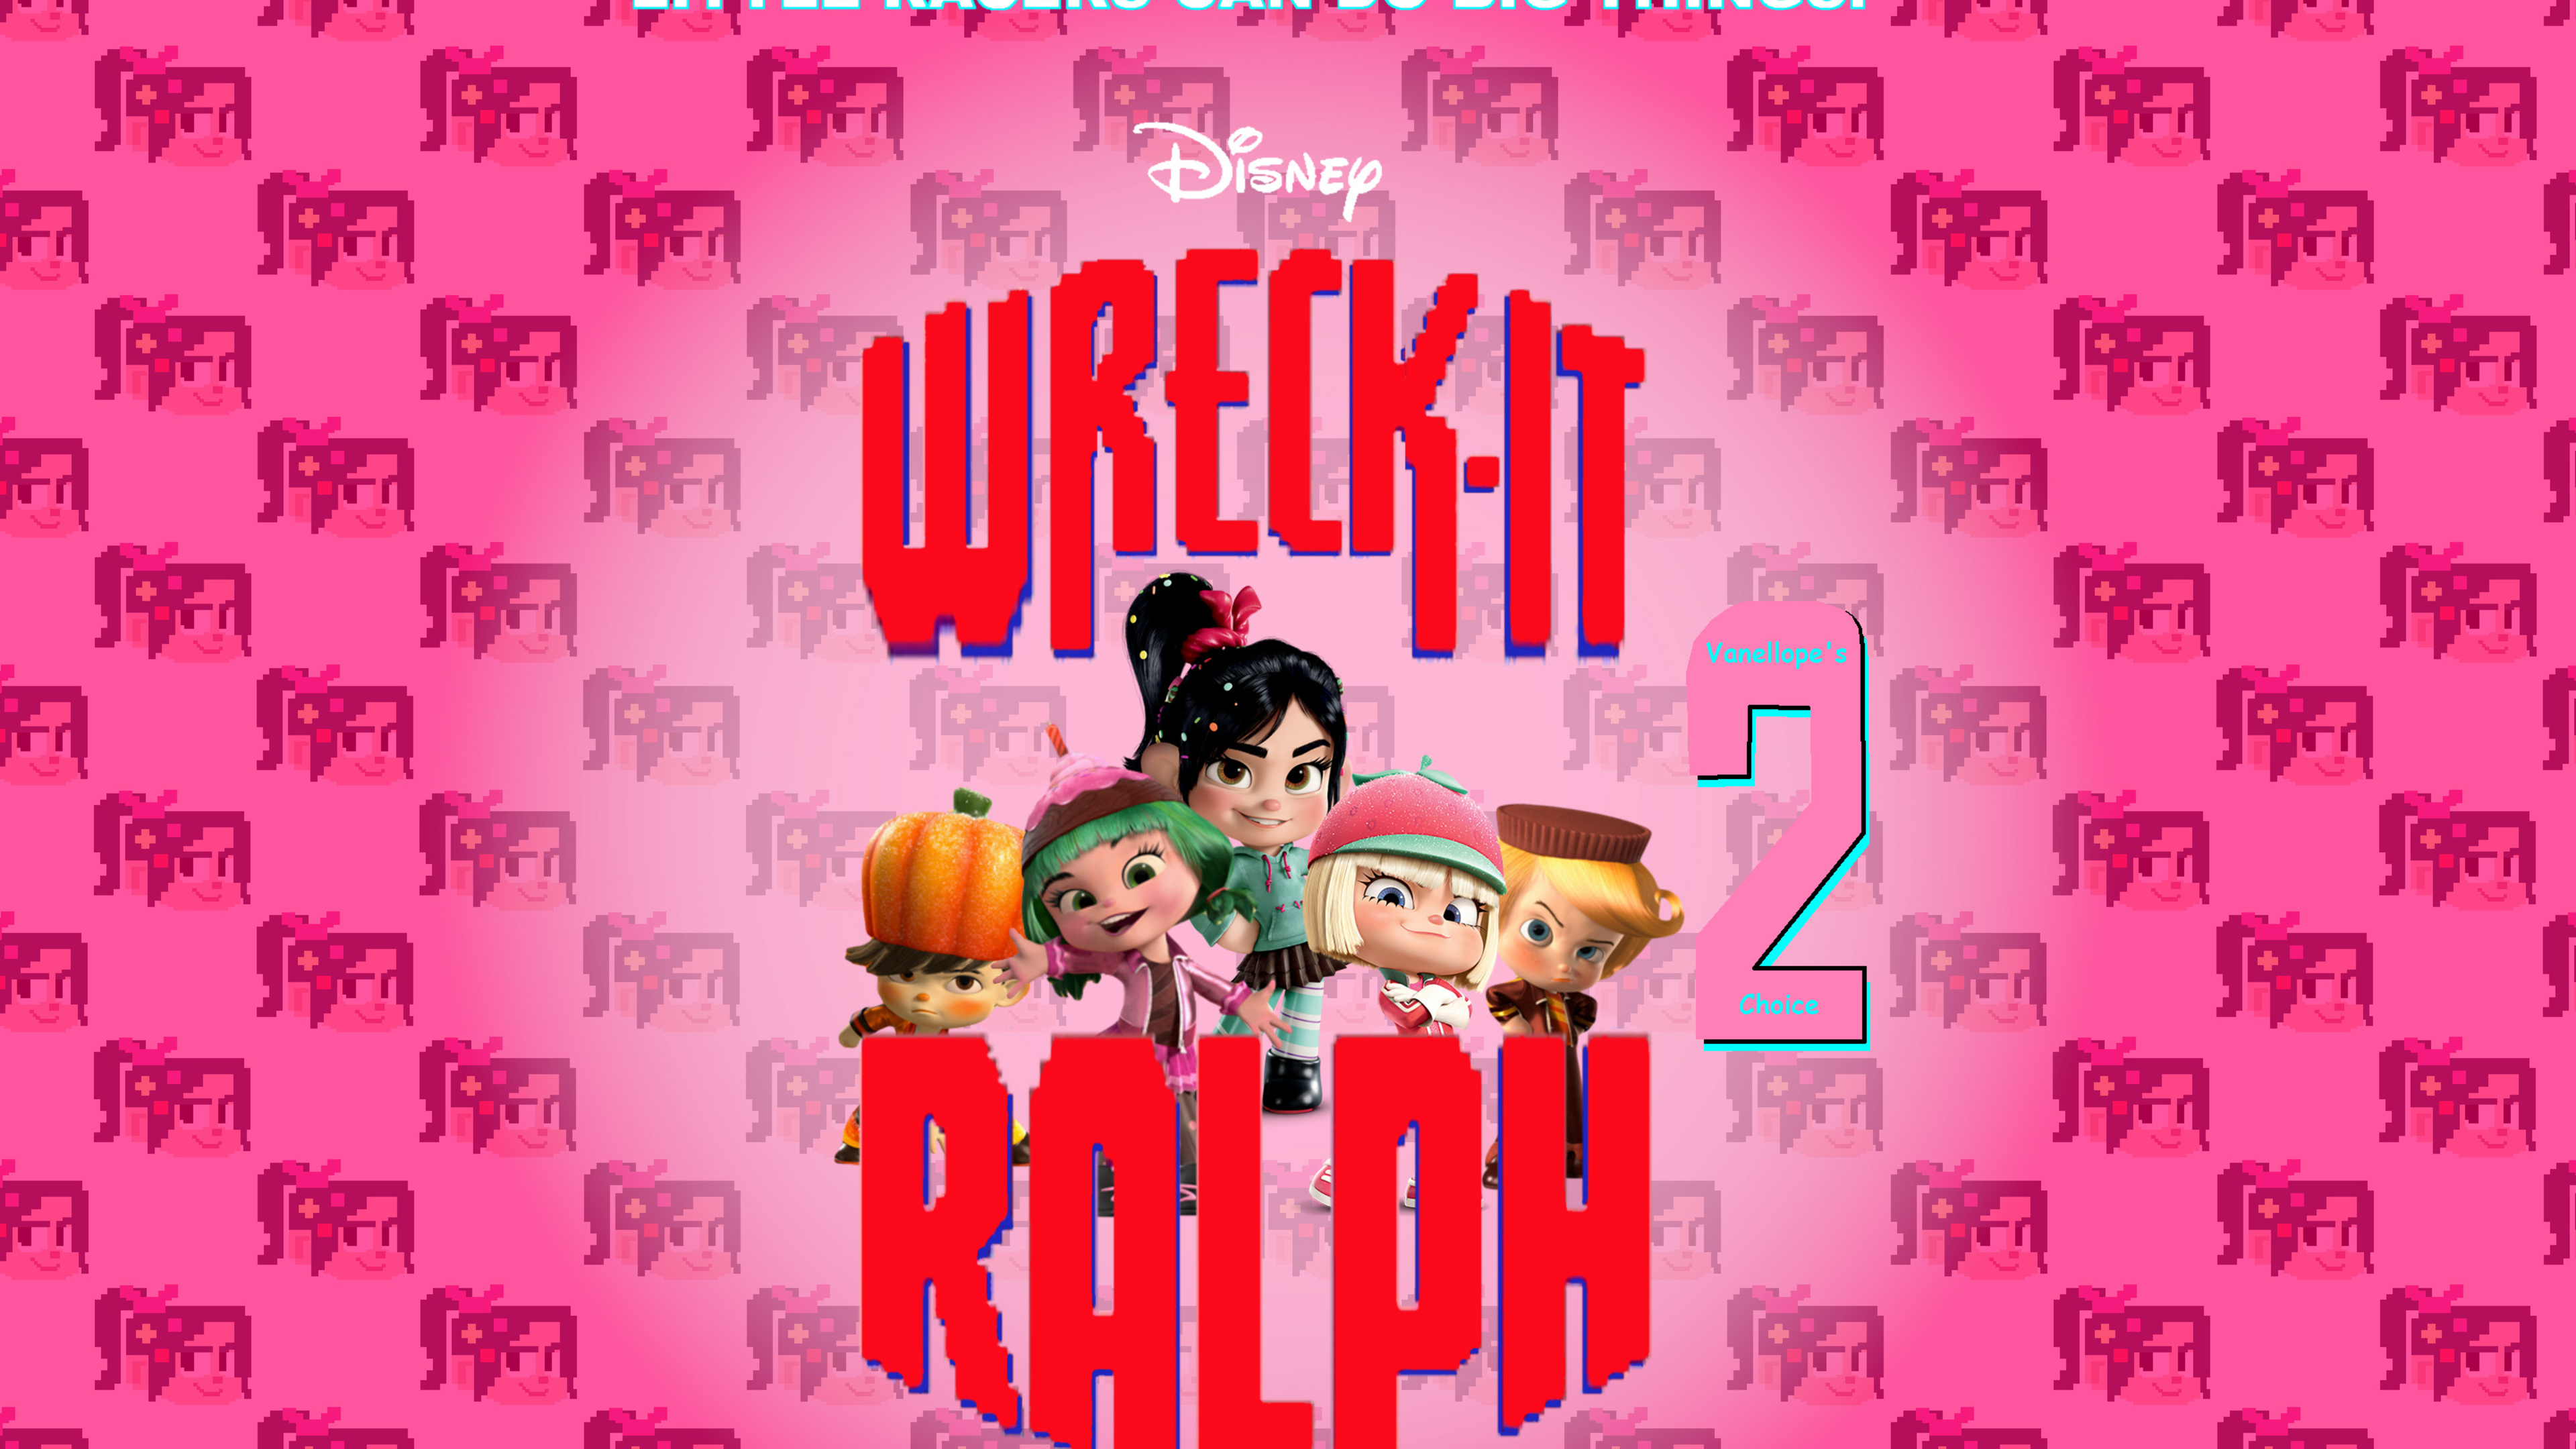 Wreck It Ralph Animation Movie 4k Hd Desktop Wallpaper For: 3840x2160 Wreck It Ralph 2 4k HD 4k Wallpapers, Images